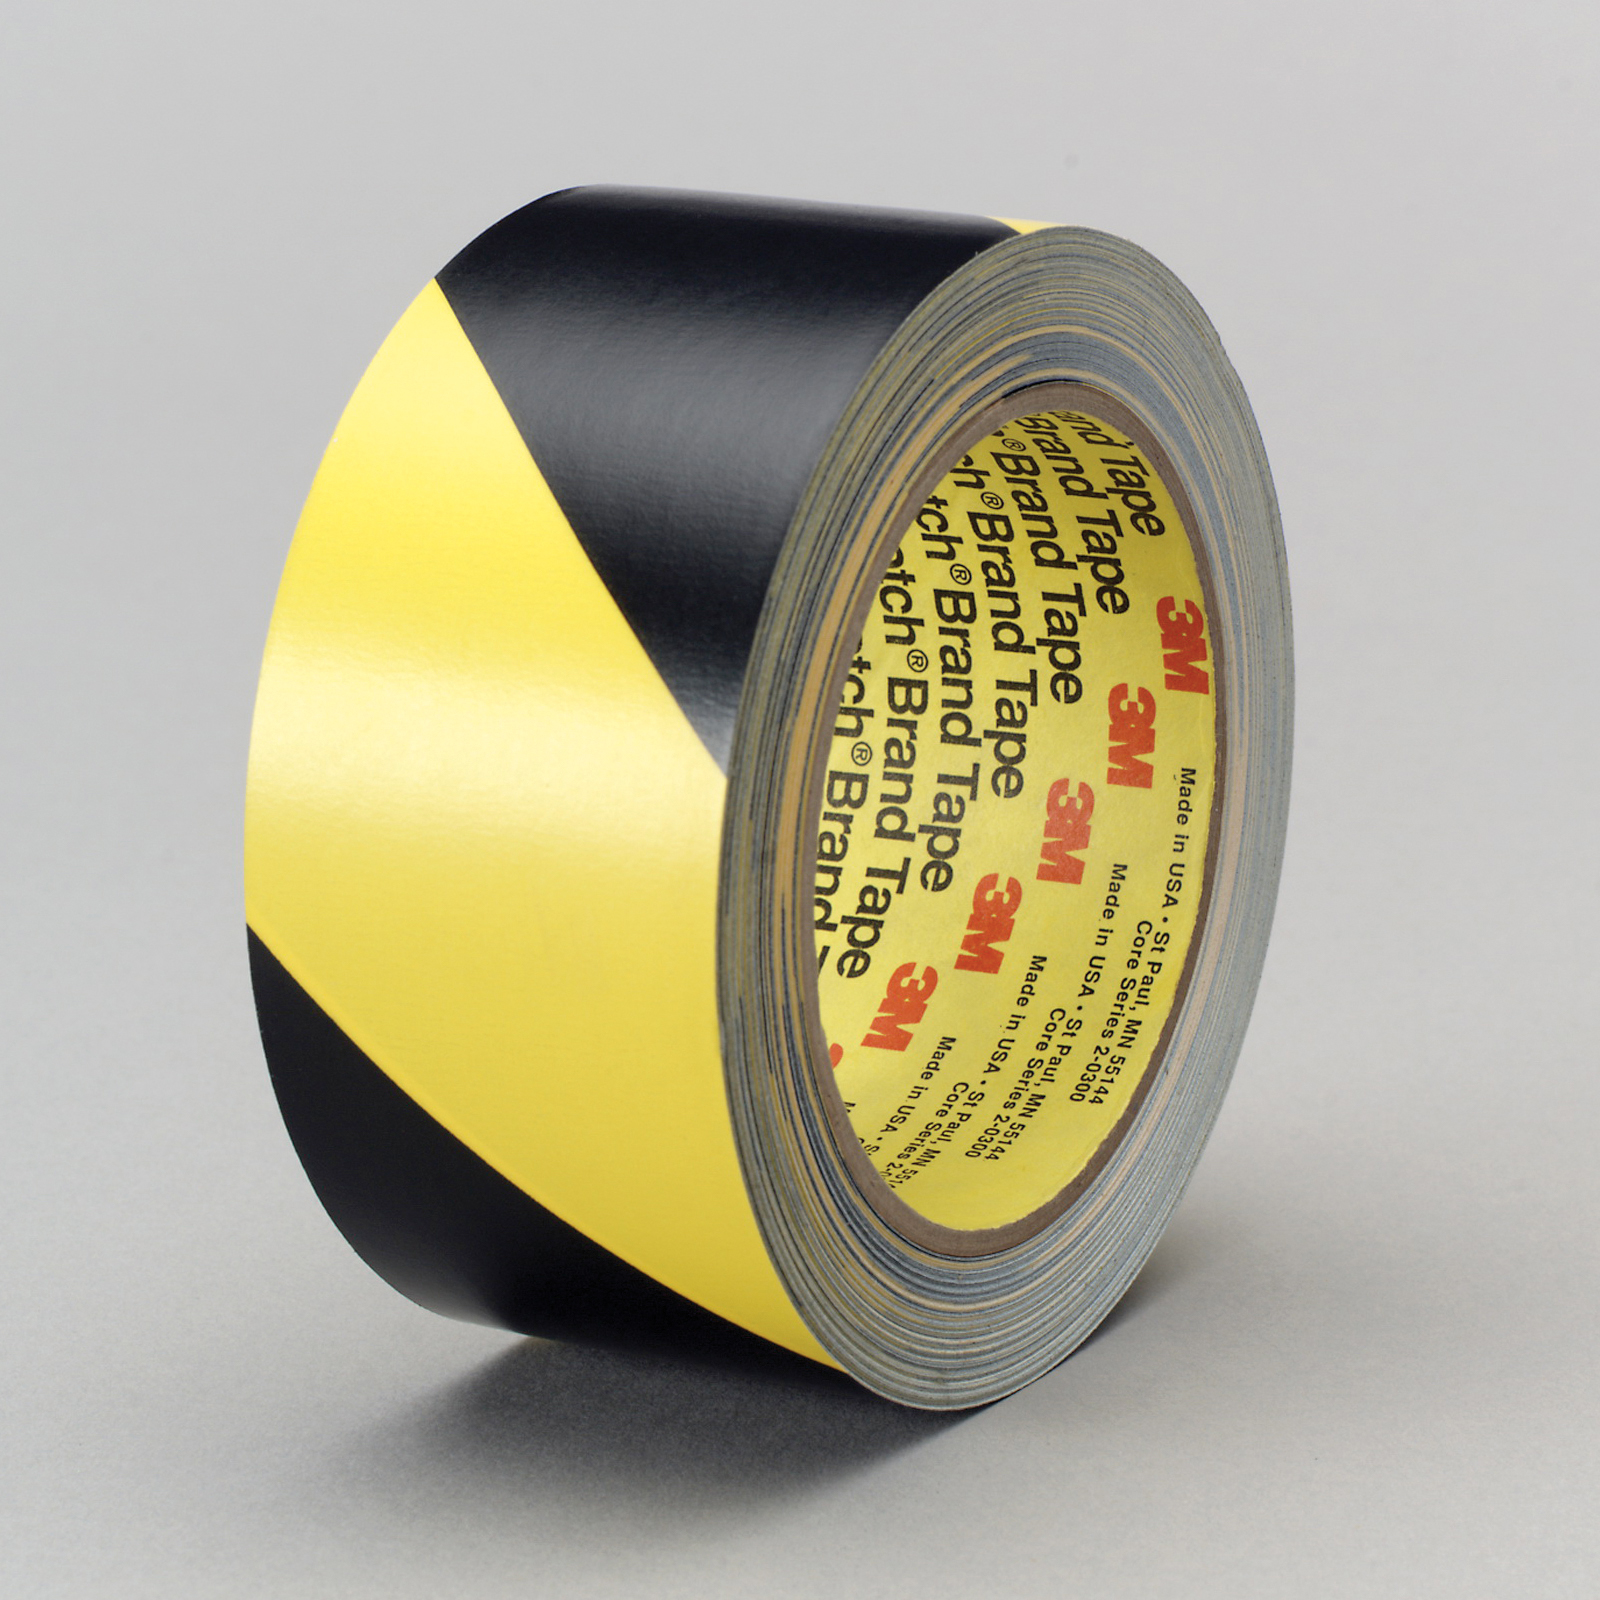 3M™ 021200-03952 5702 Safety Stripe Tape, 36 yd L x 4 in W, Black/Yellow